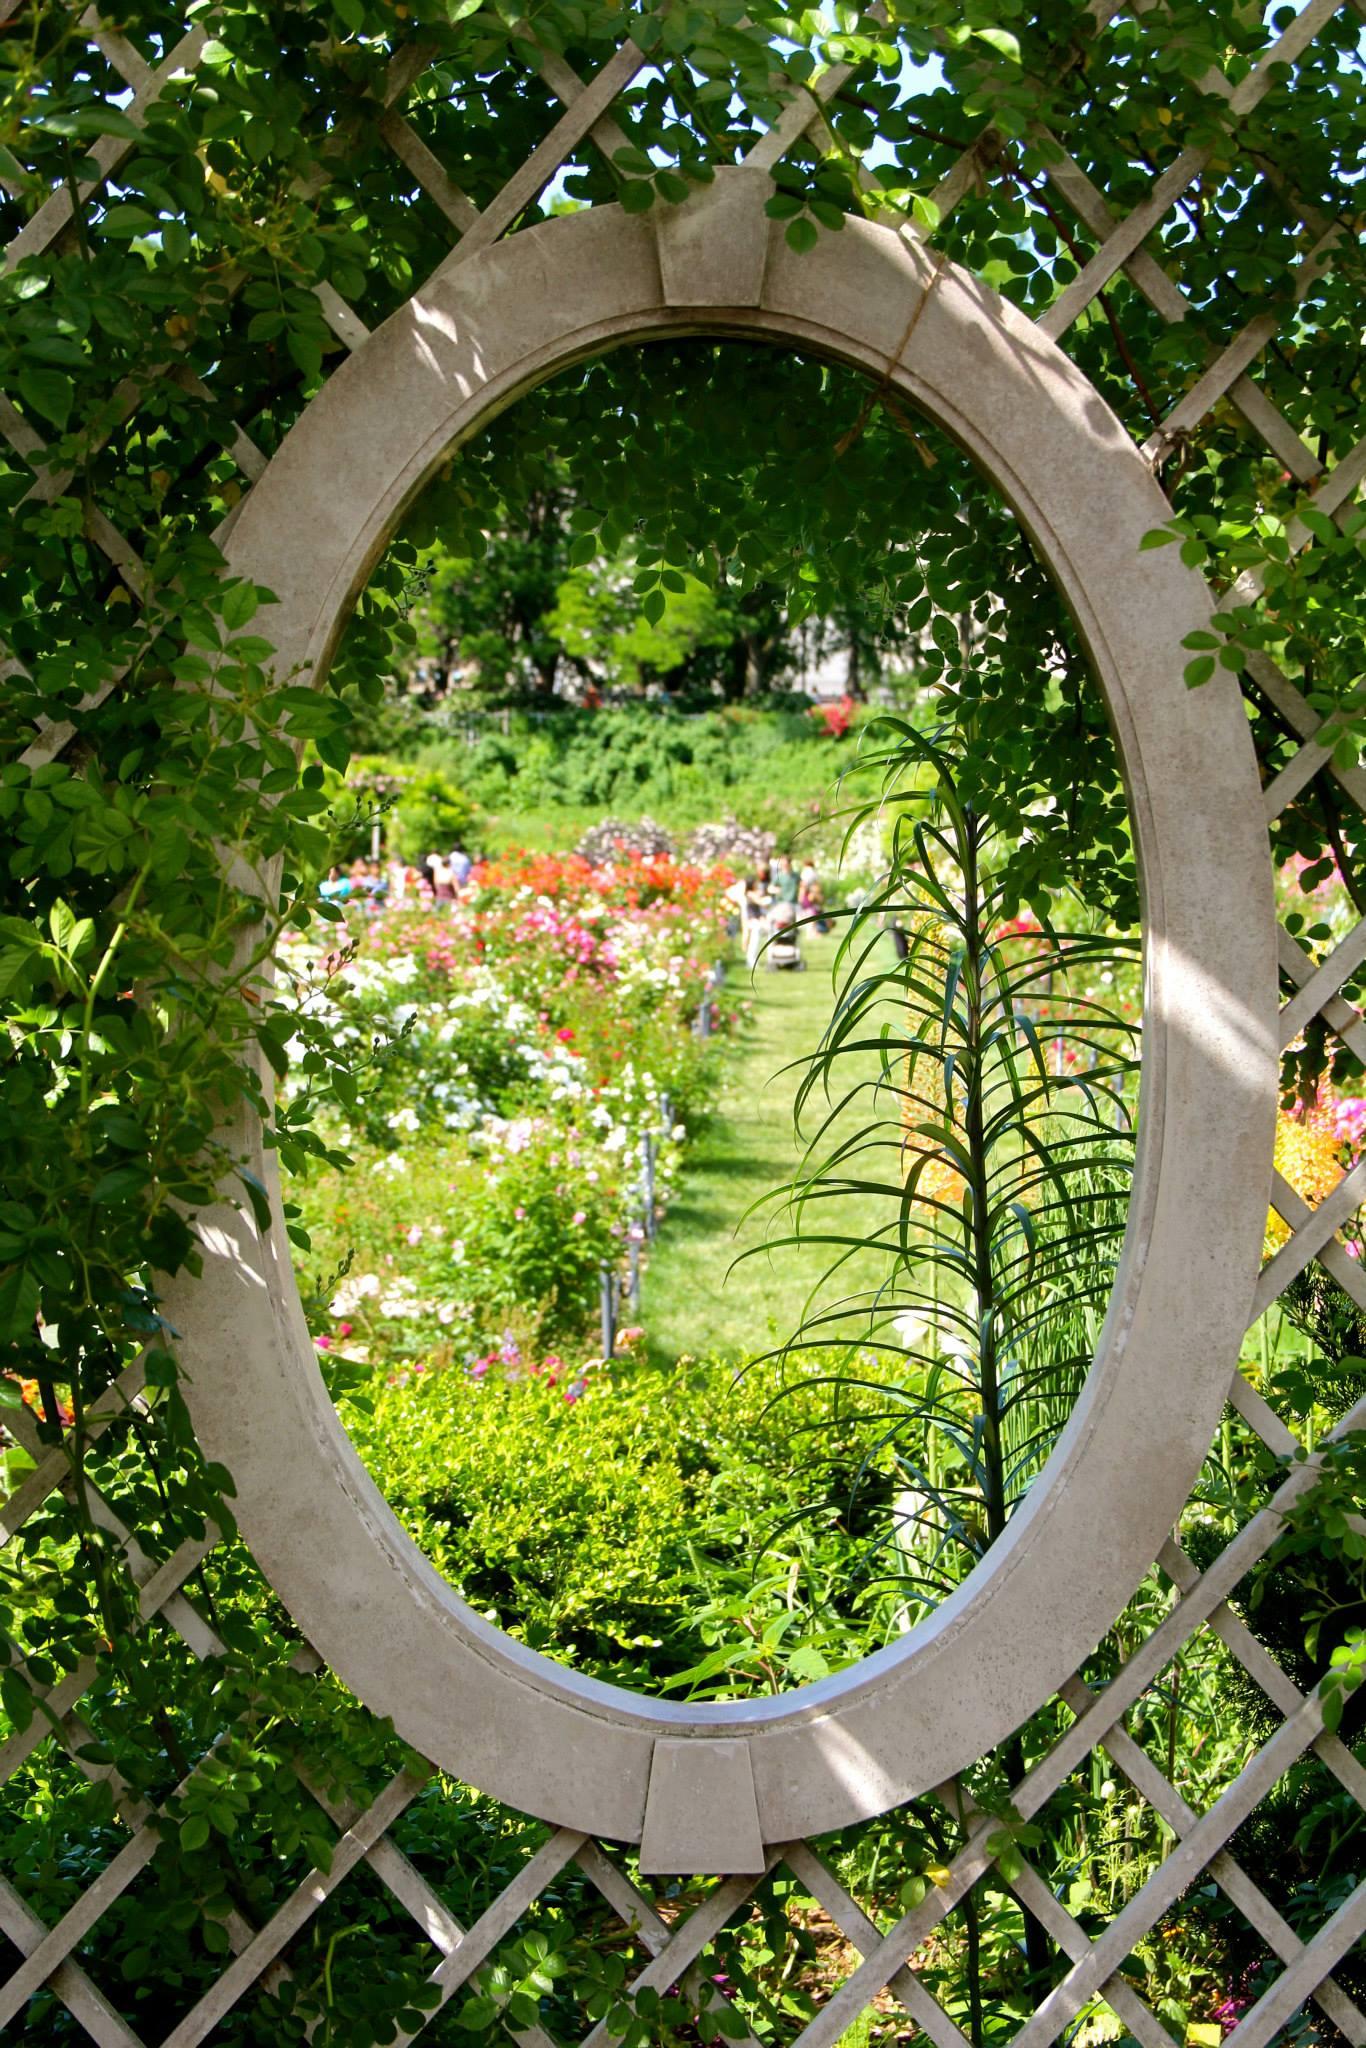 Brooklyn Botanic Garden, New York, NY, USA